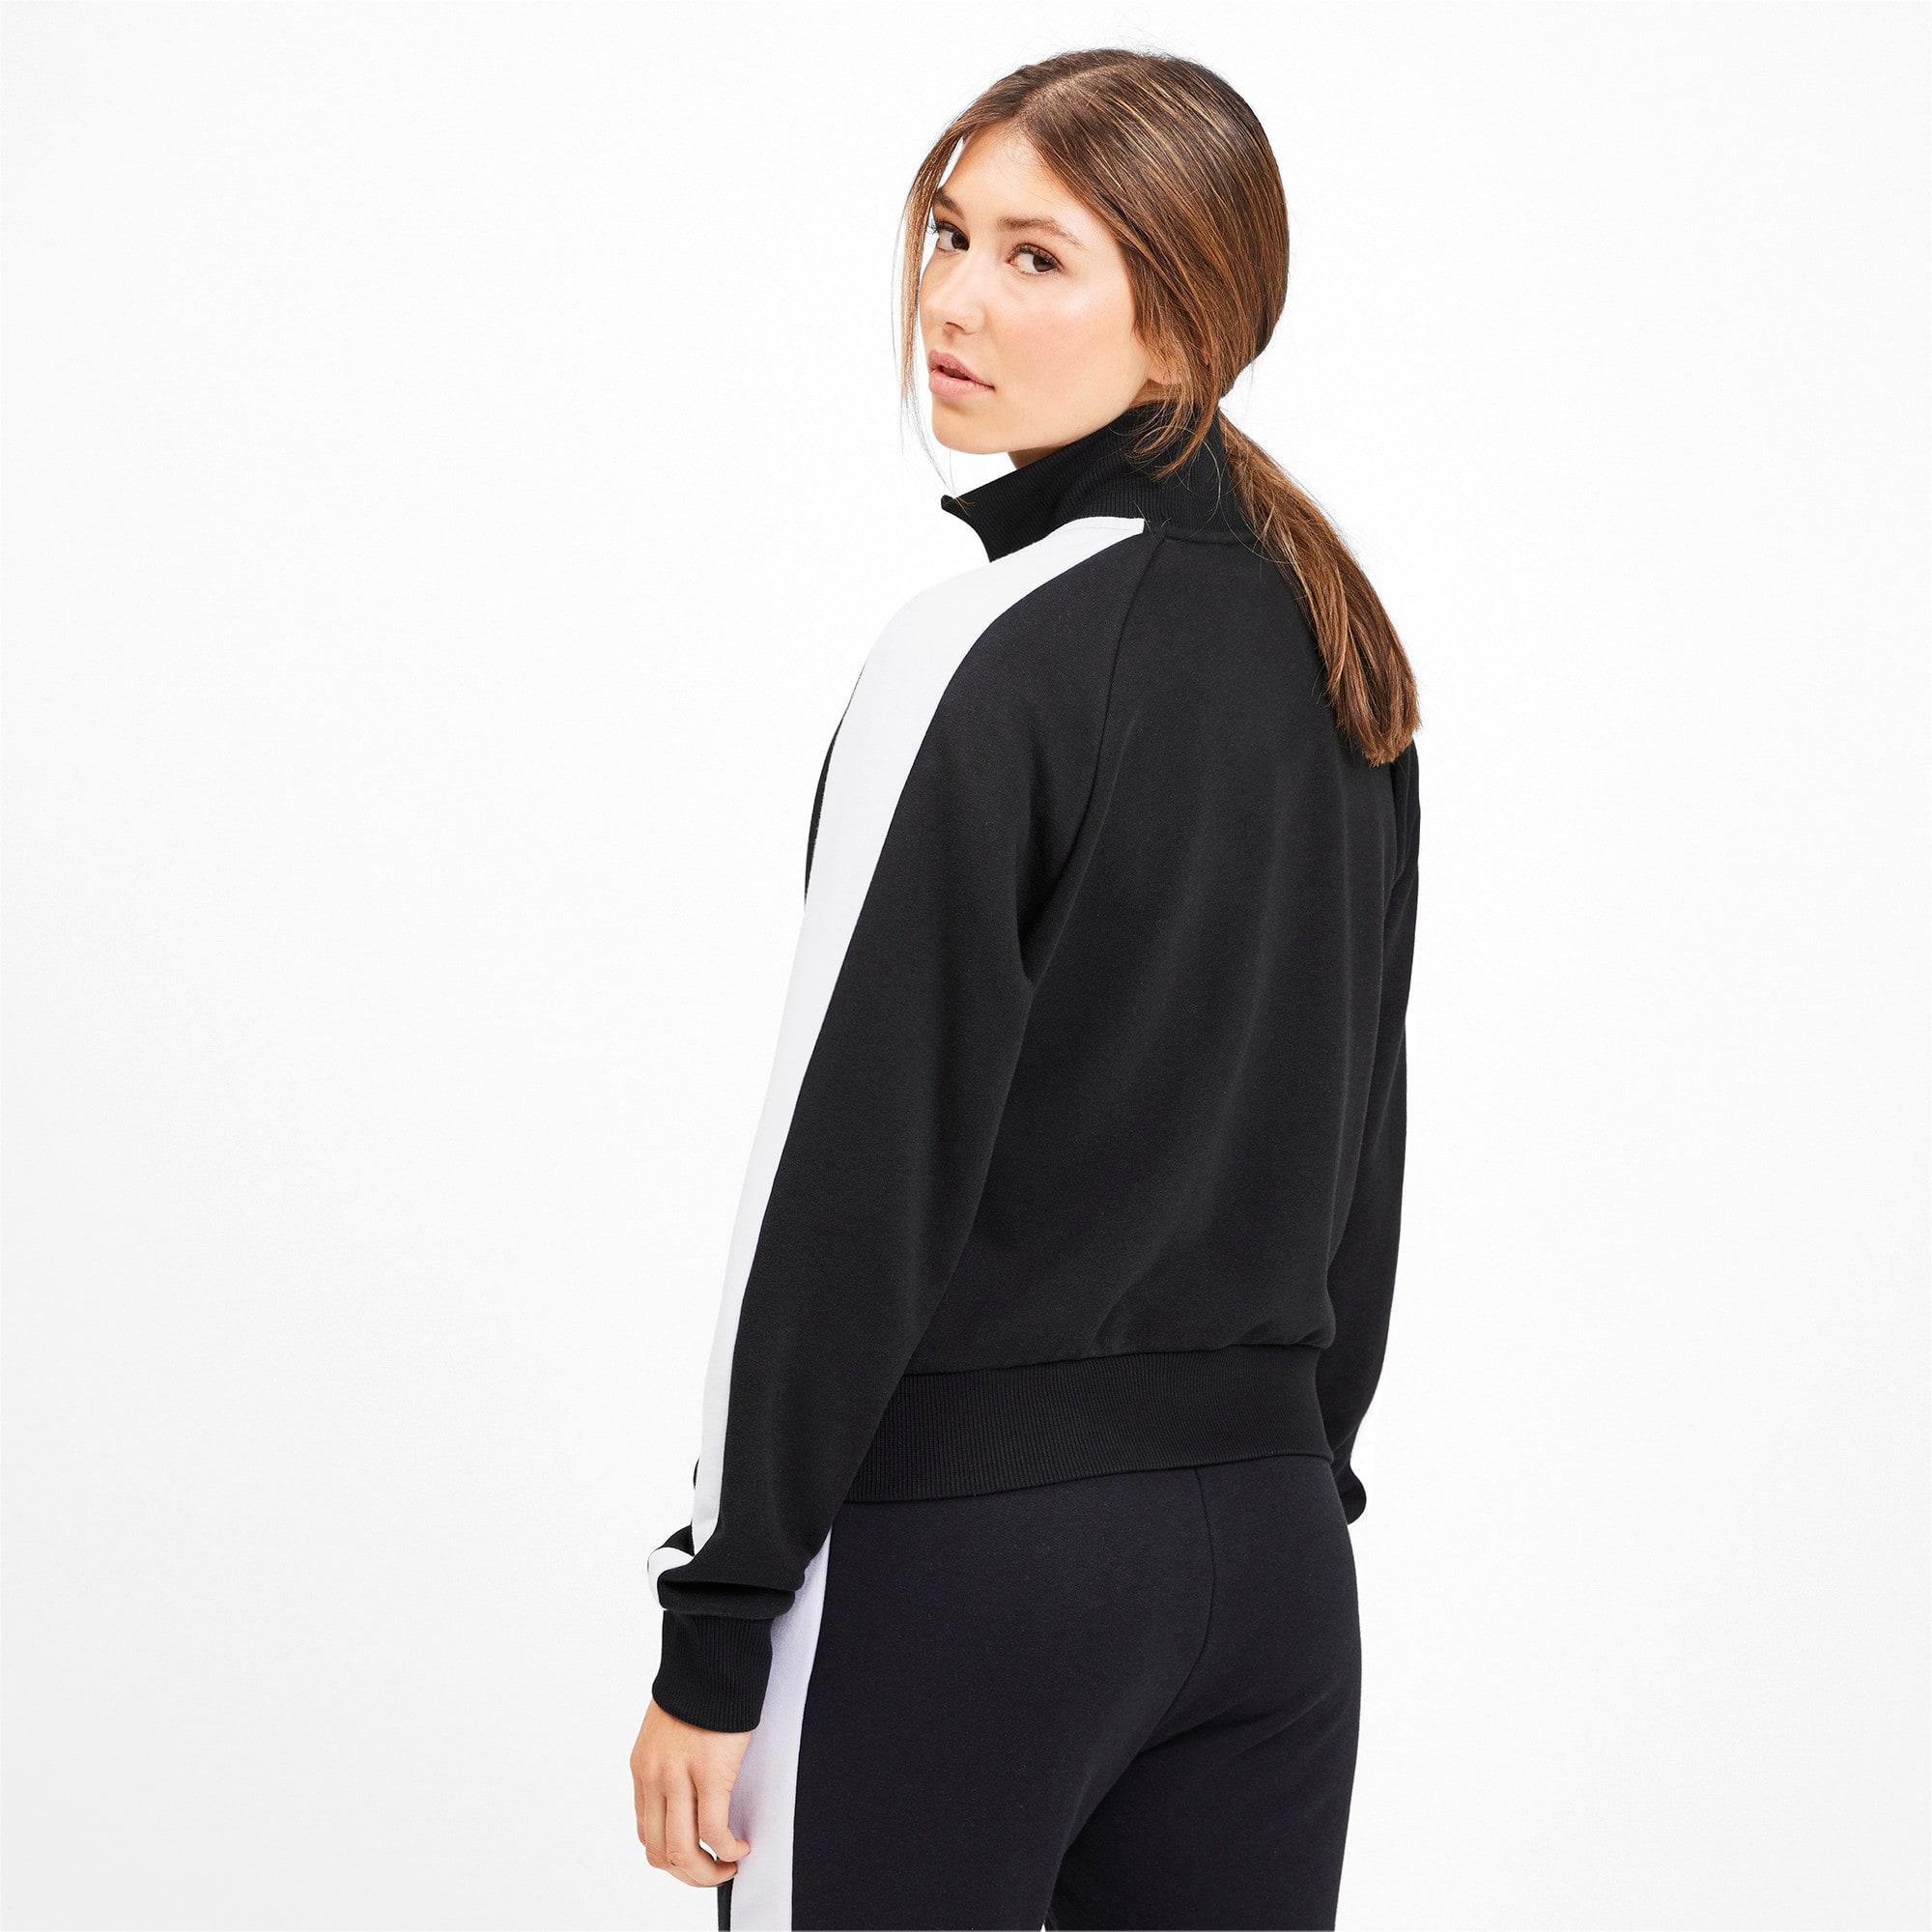 Miniatura 3 de Chaqueta deportiva Classics T7 para mujer, Puma Black, mediano